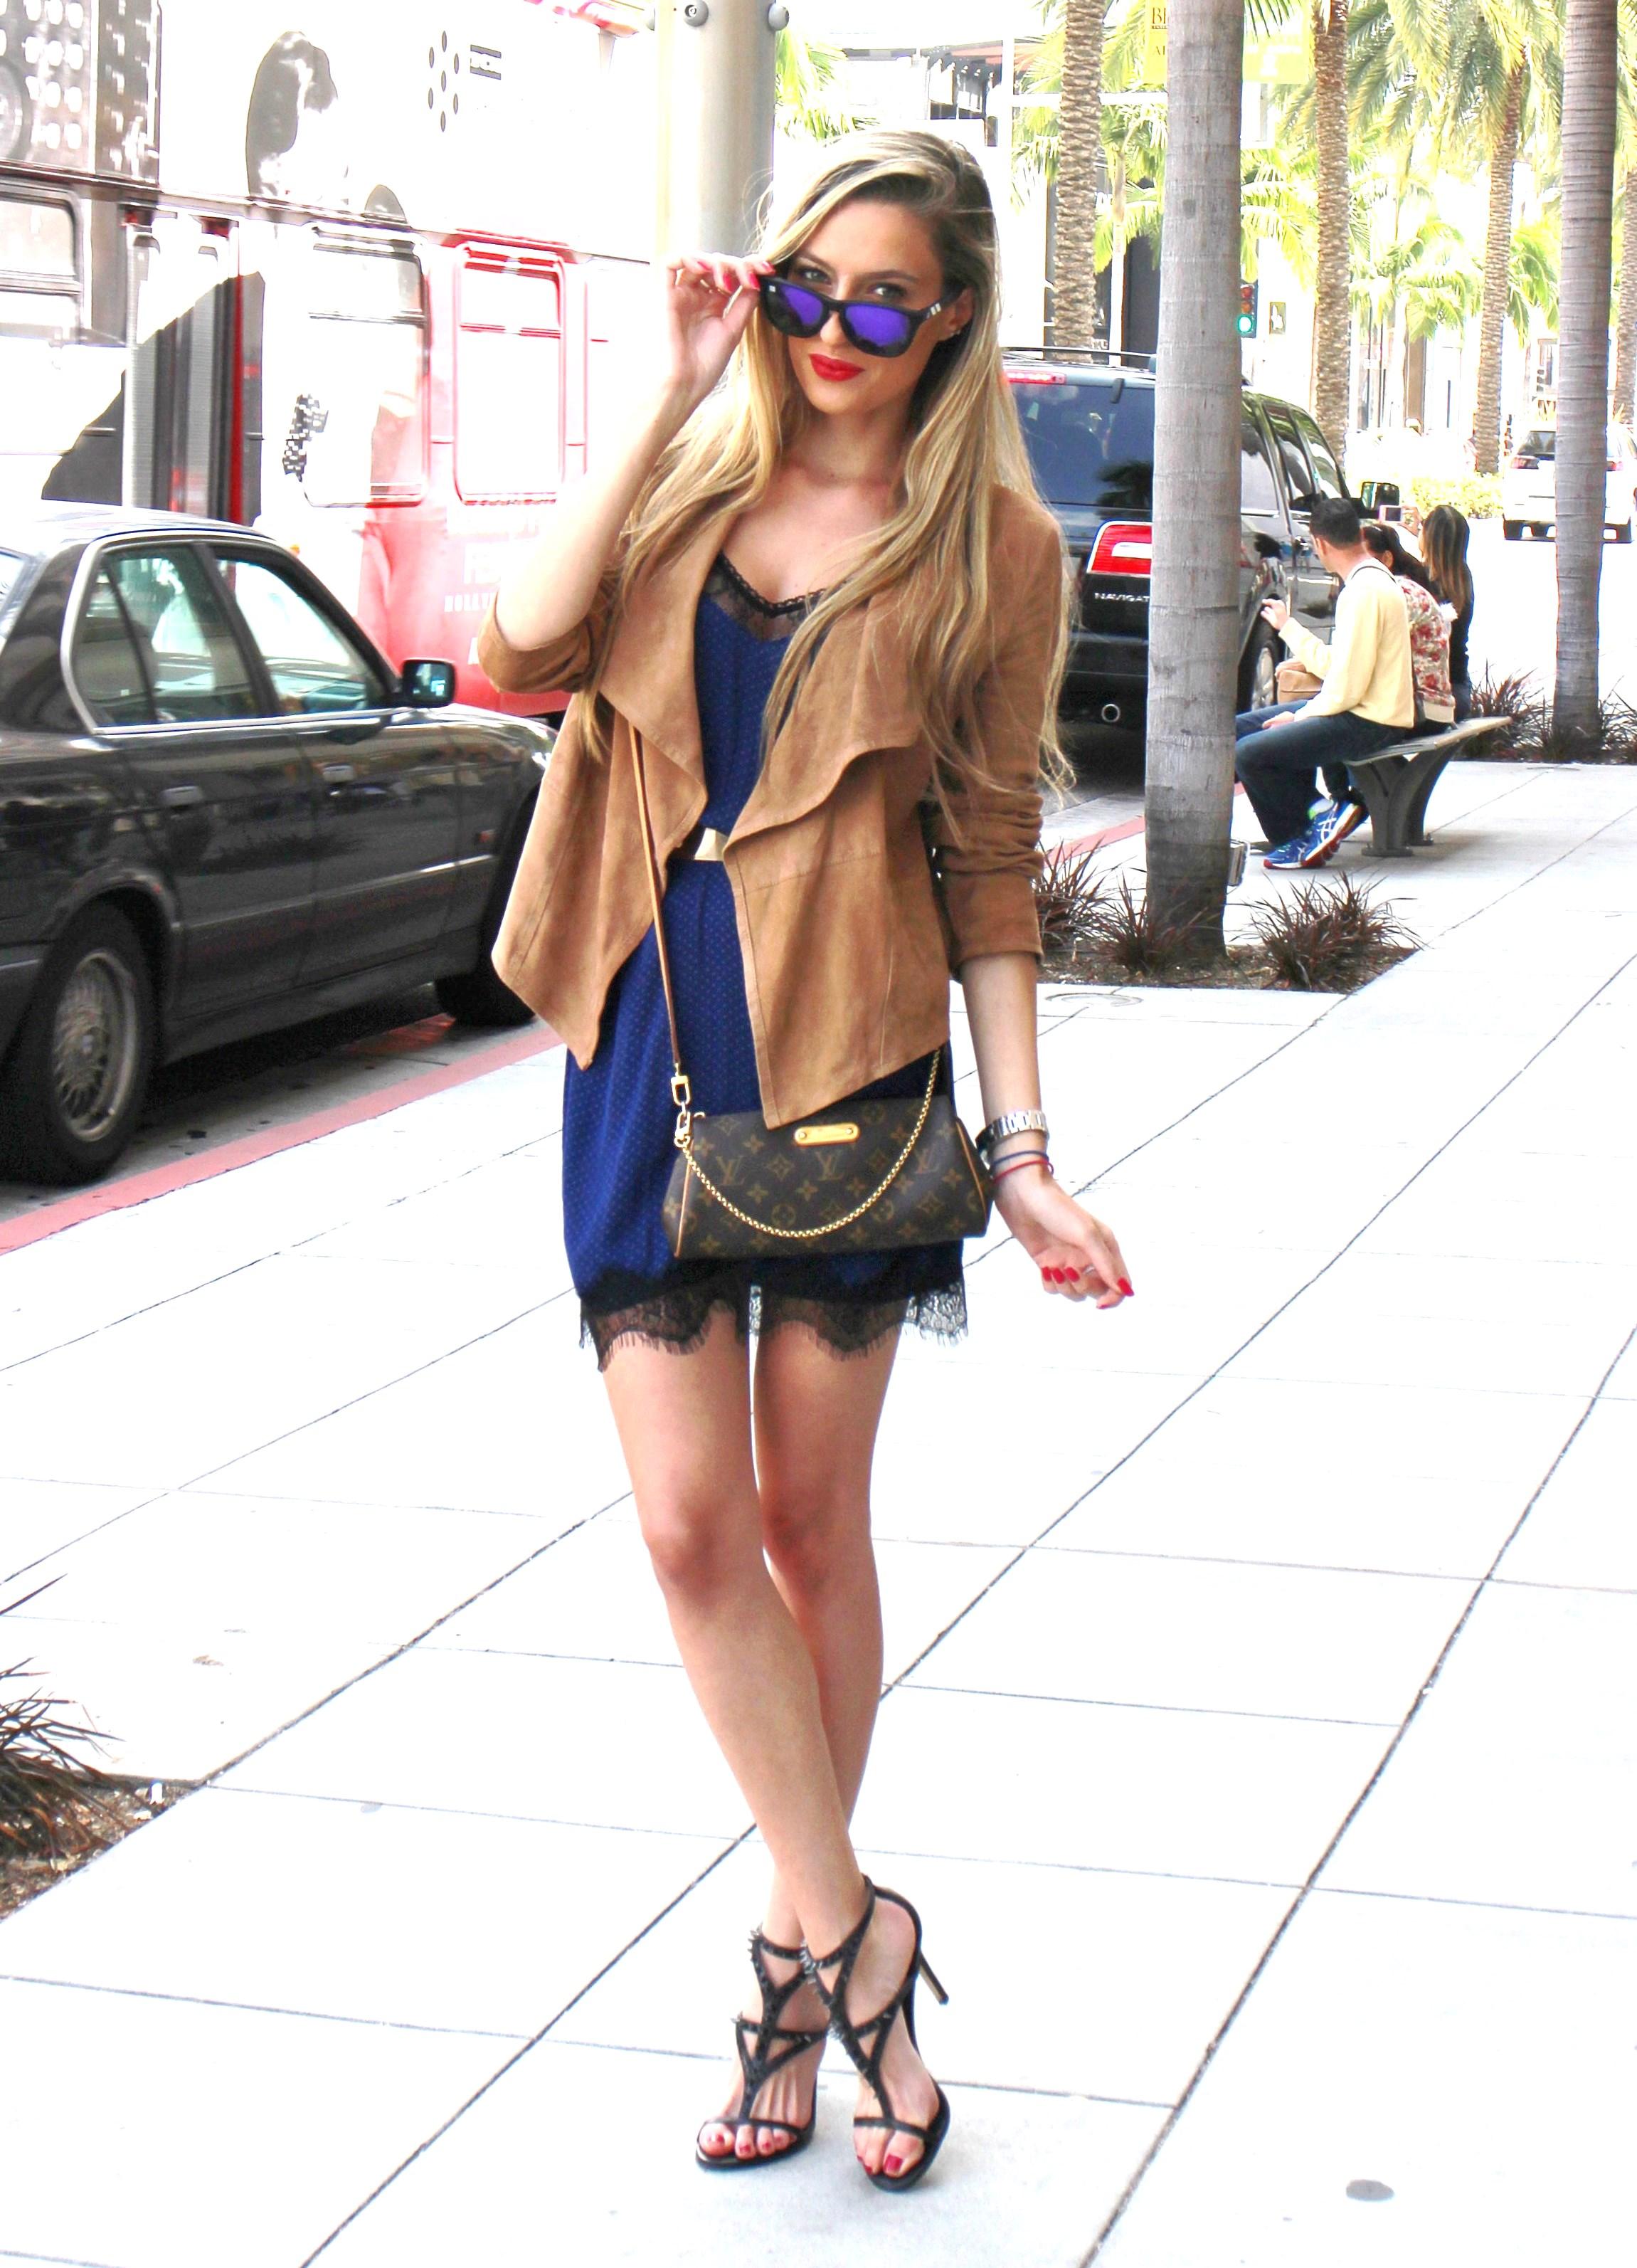 Rodeo_Drive_Los_Angeles_California_Shopping_Lara_Martin_Gilarranz_Bymyheels (5)